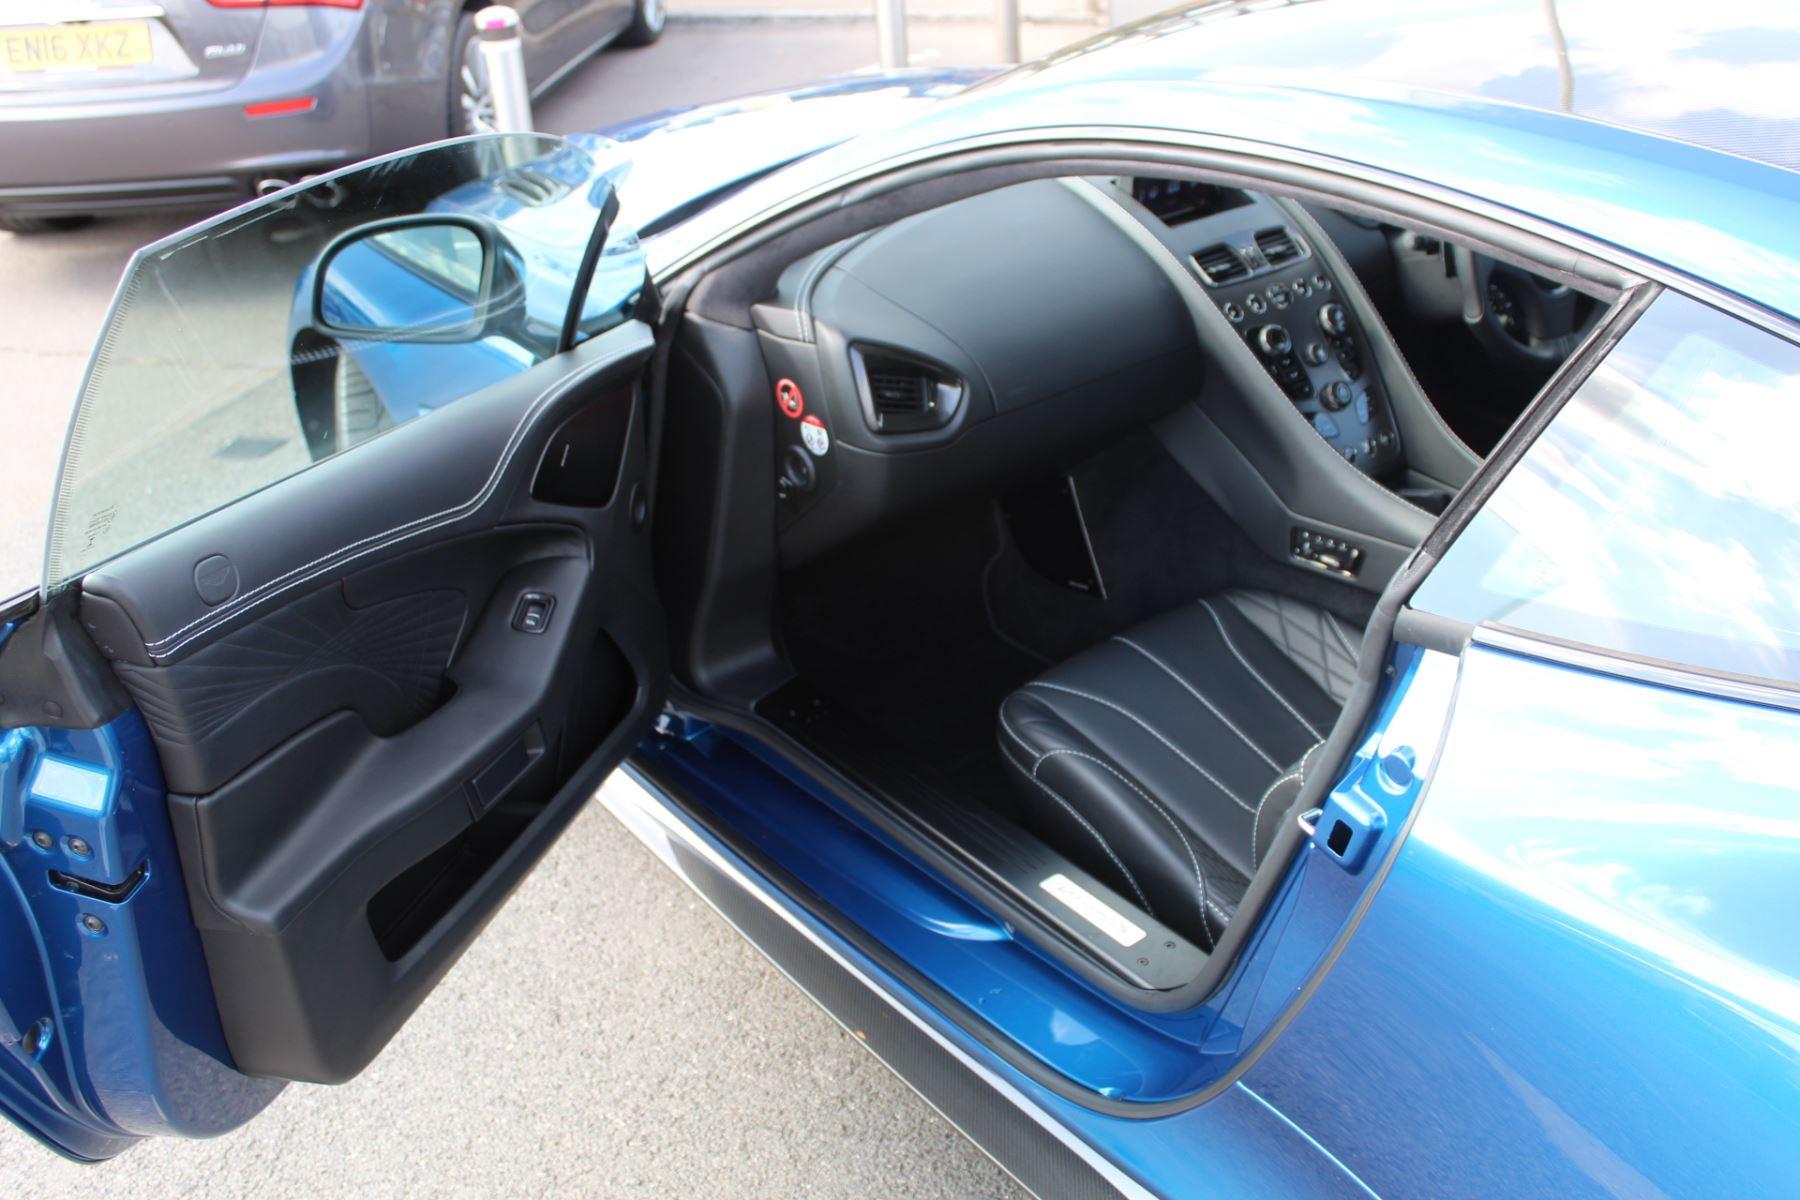 Aston Martin Vanquish V12 [595] S 2+2 2dr Touchtronic image 18